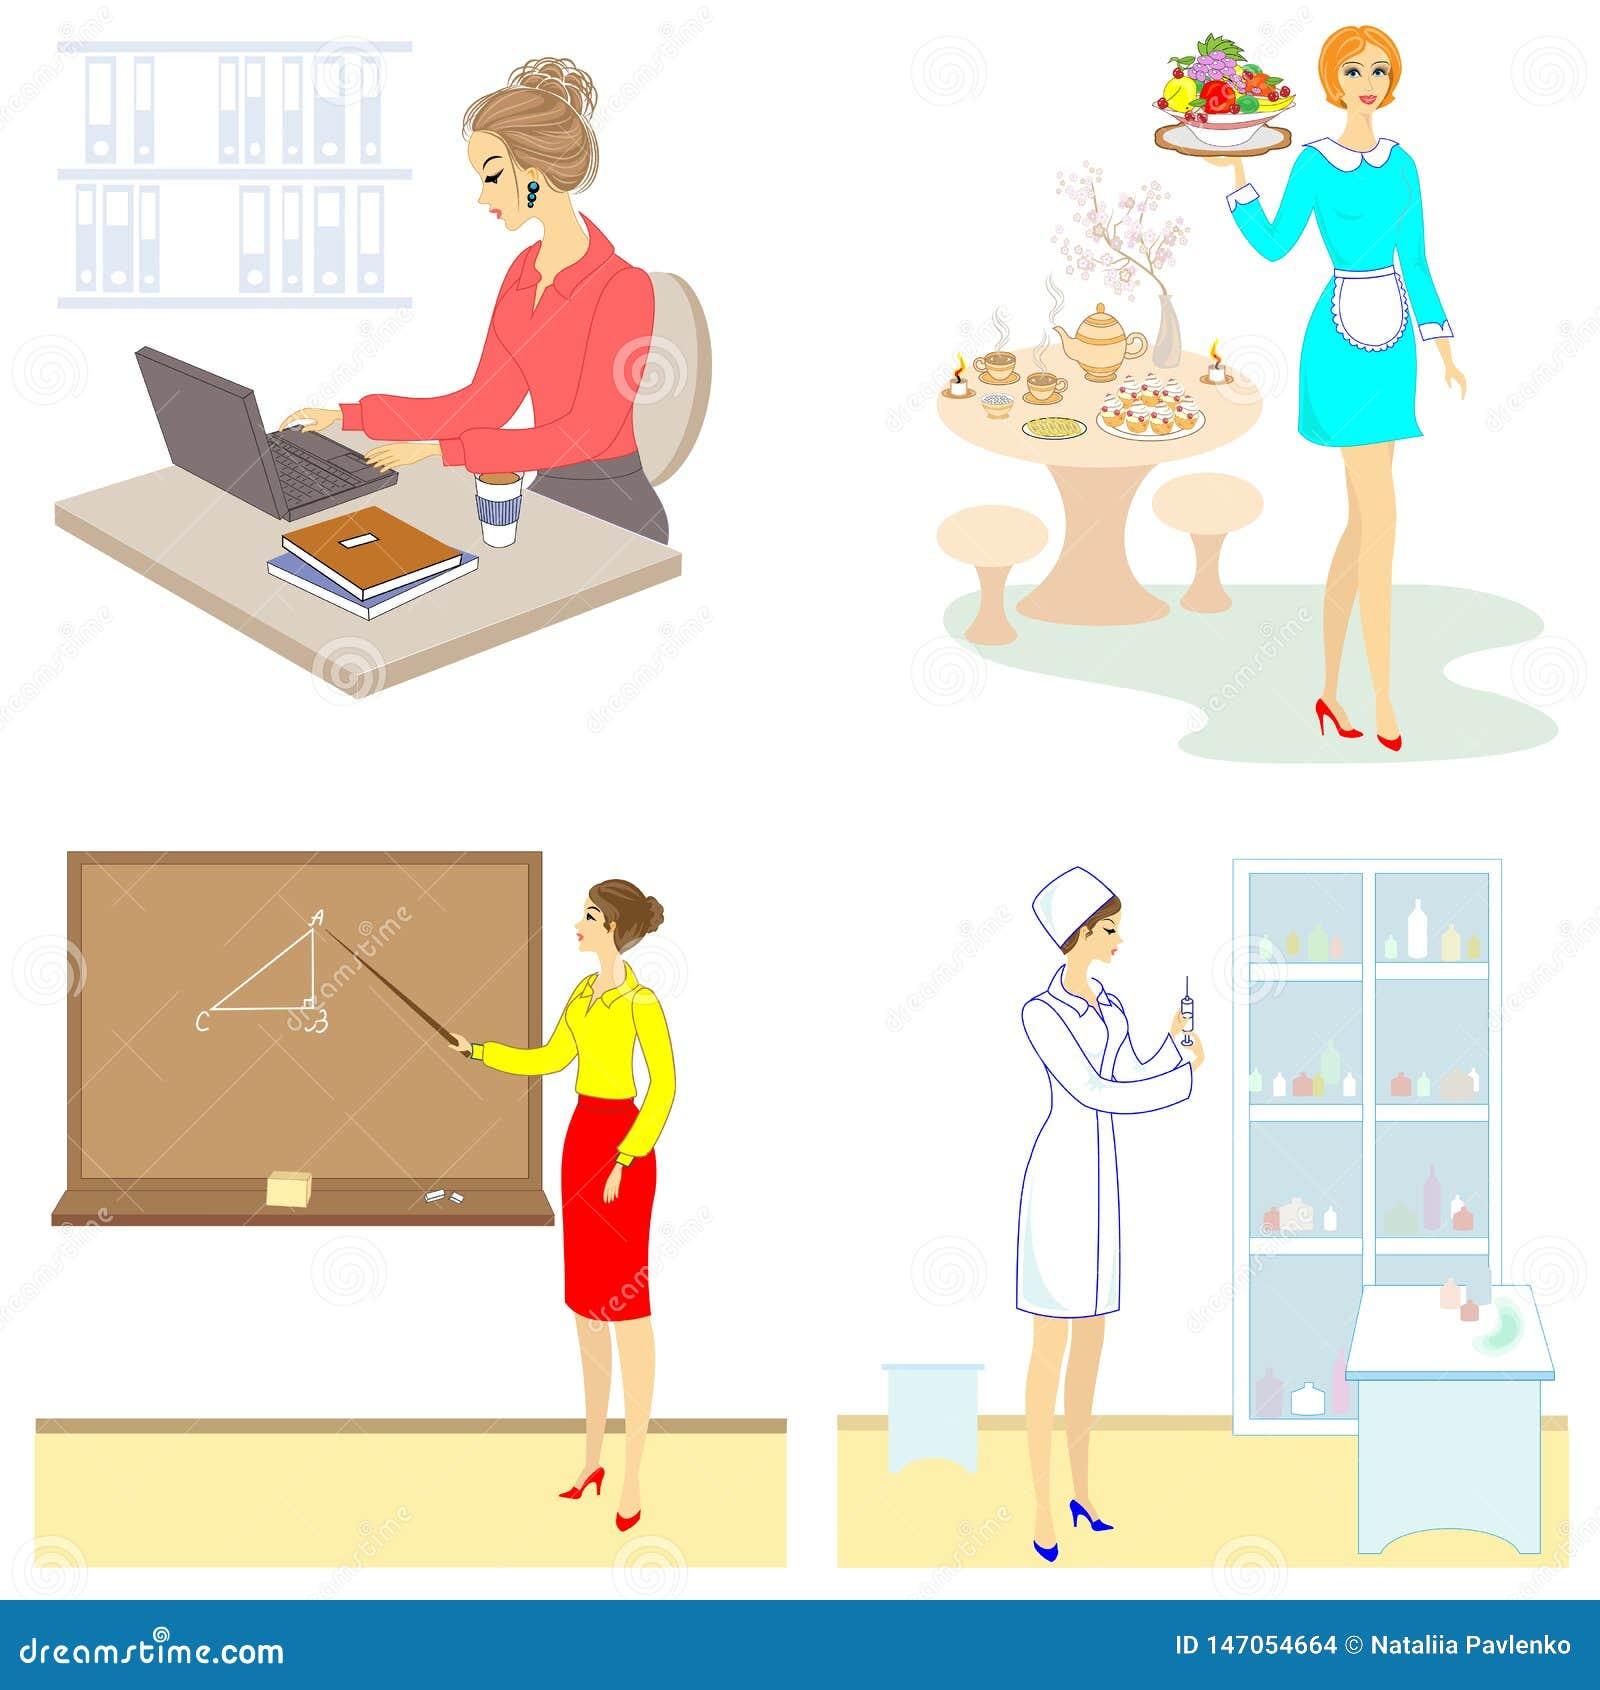 Collection. Professions for a lady. Woman teacher, nurse, secretary, waitress. Vector illustration set